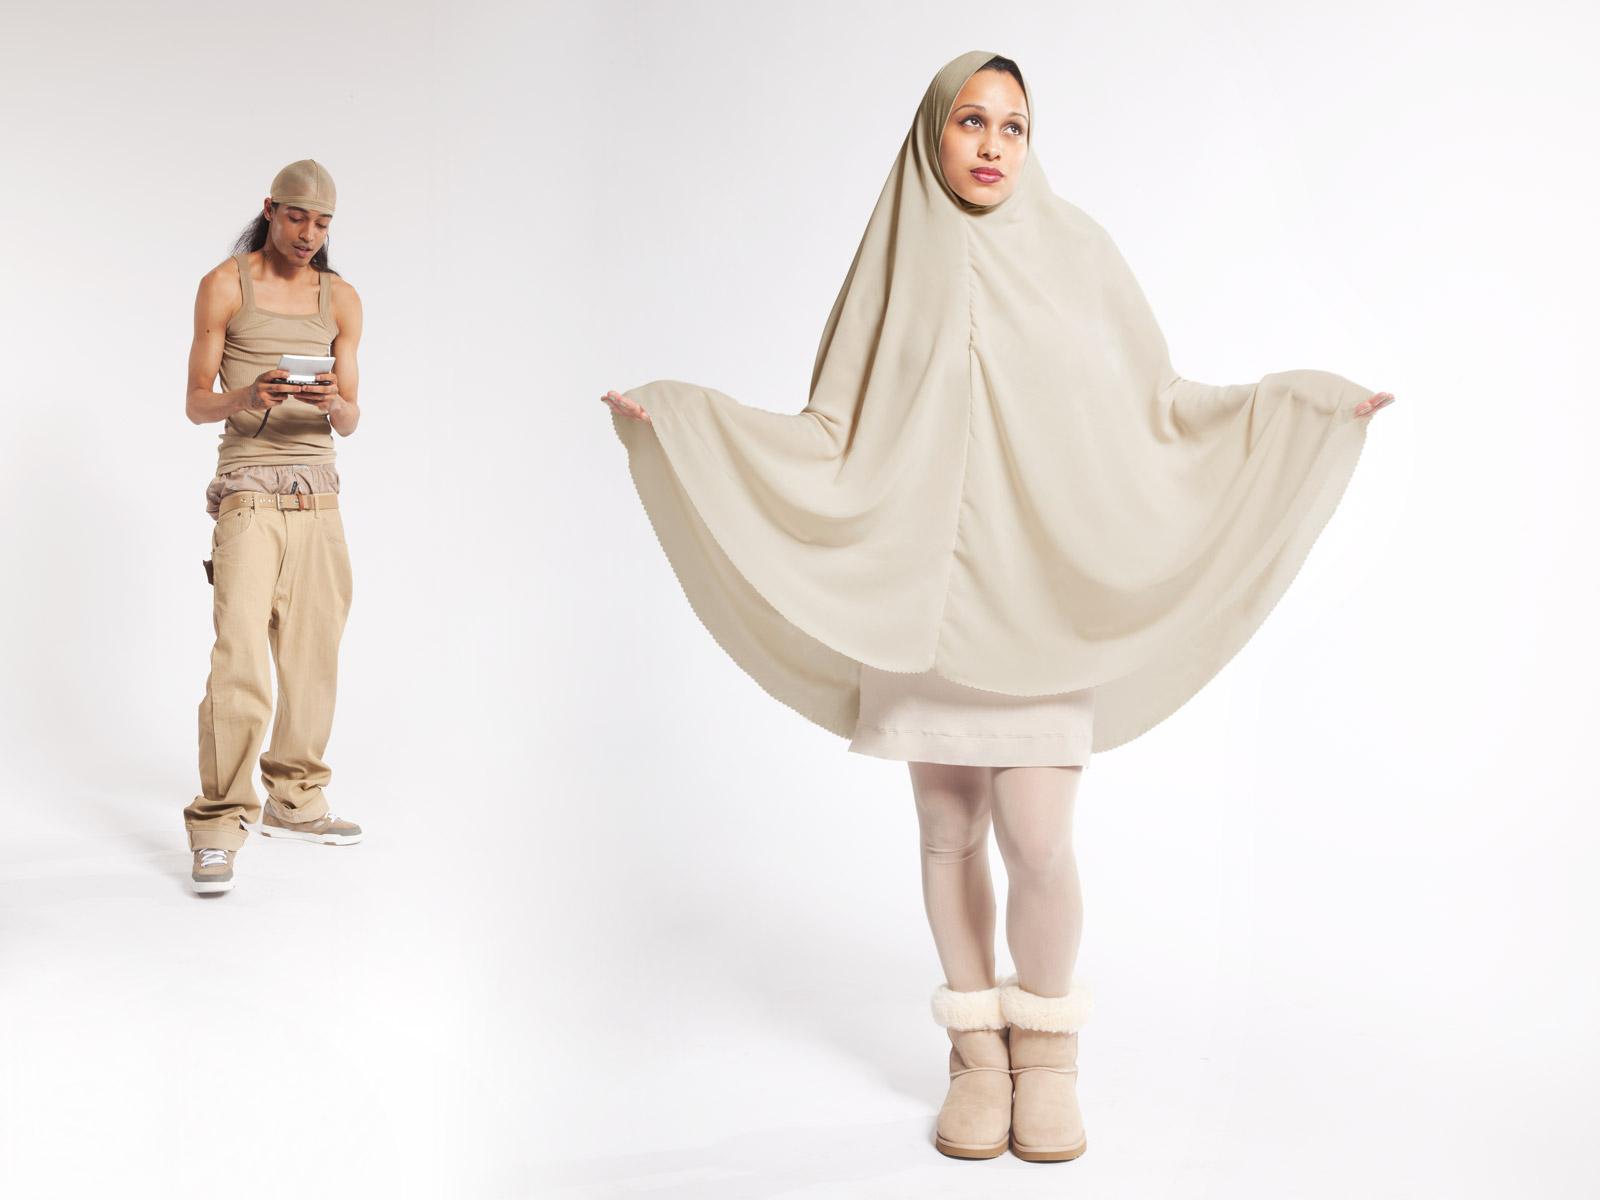 Khaki: Venus wears Fogal Dress, Daryl K leggings, and Uggs.